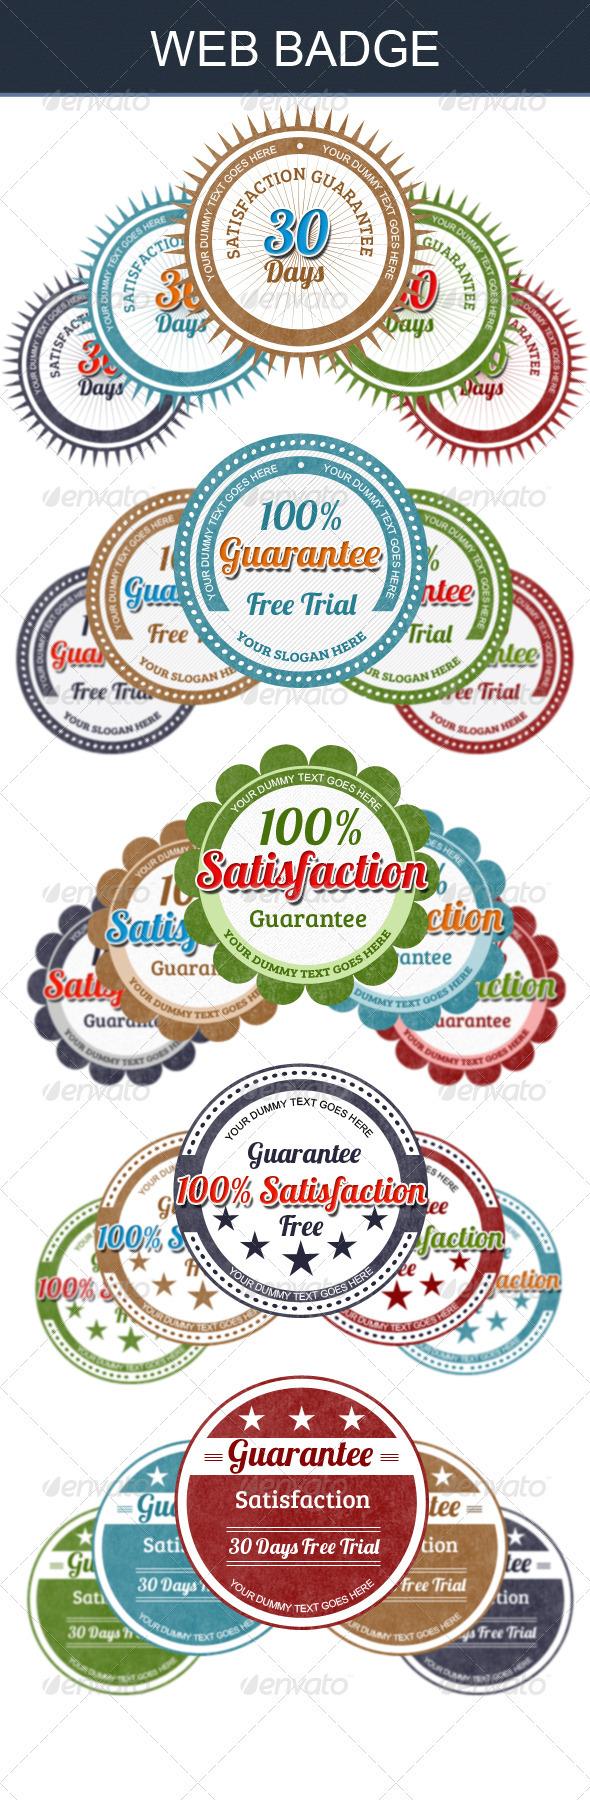 GraphicRiver New Web Badge 1869729